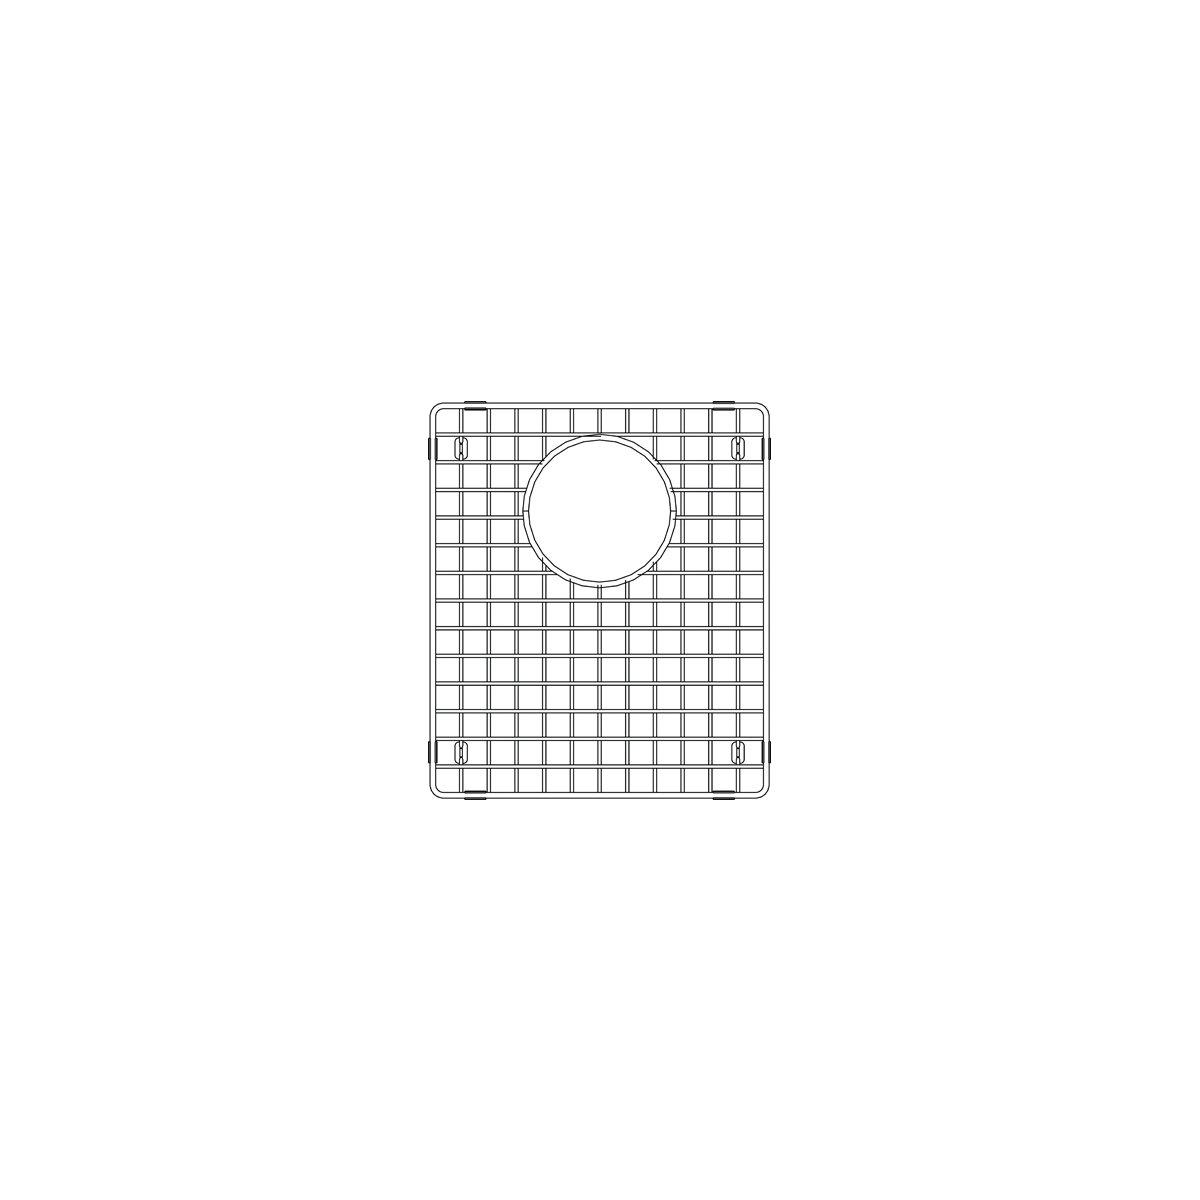 Blanco Precis 12 X 14 Sink Grid Reviews Wayfair